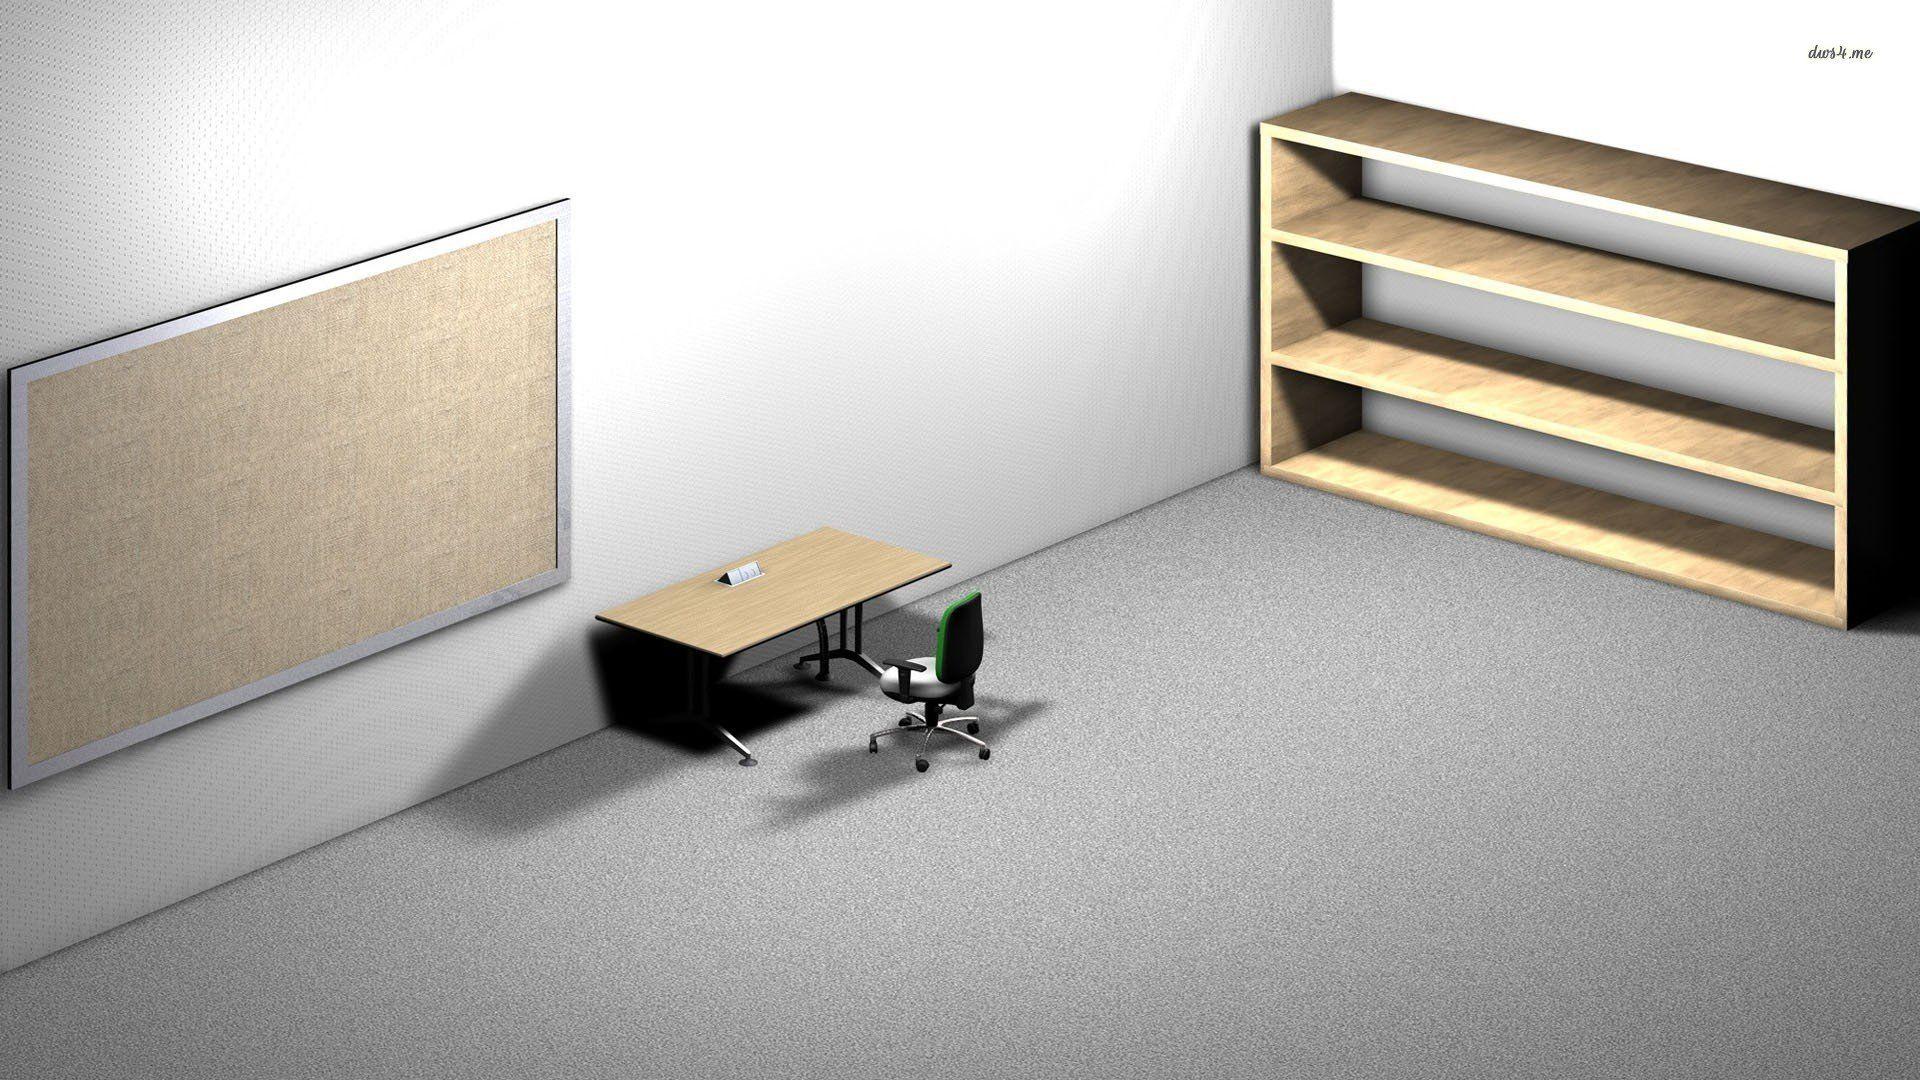 Office Wallpaper High Quality Resolution Lda Office Wallpaper Best Desk Simple House Design